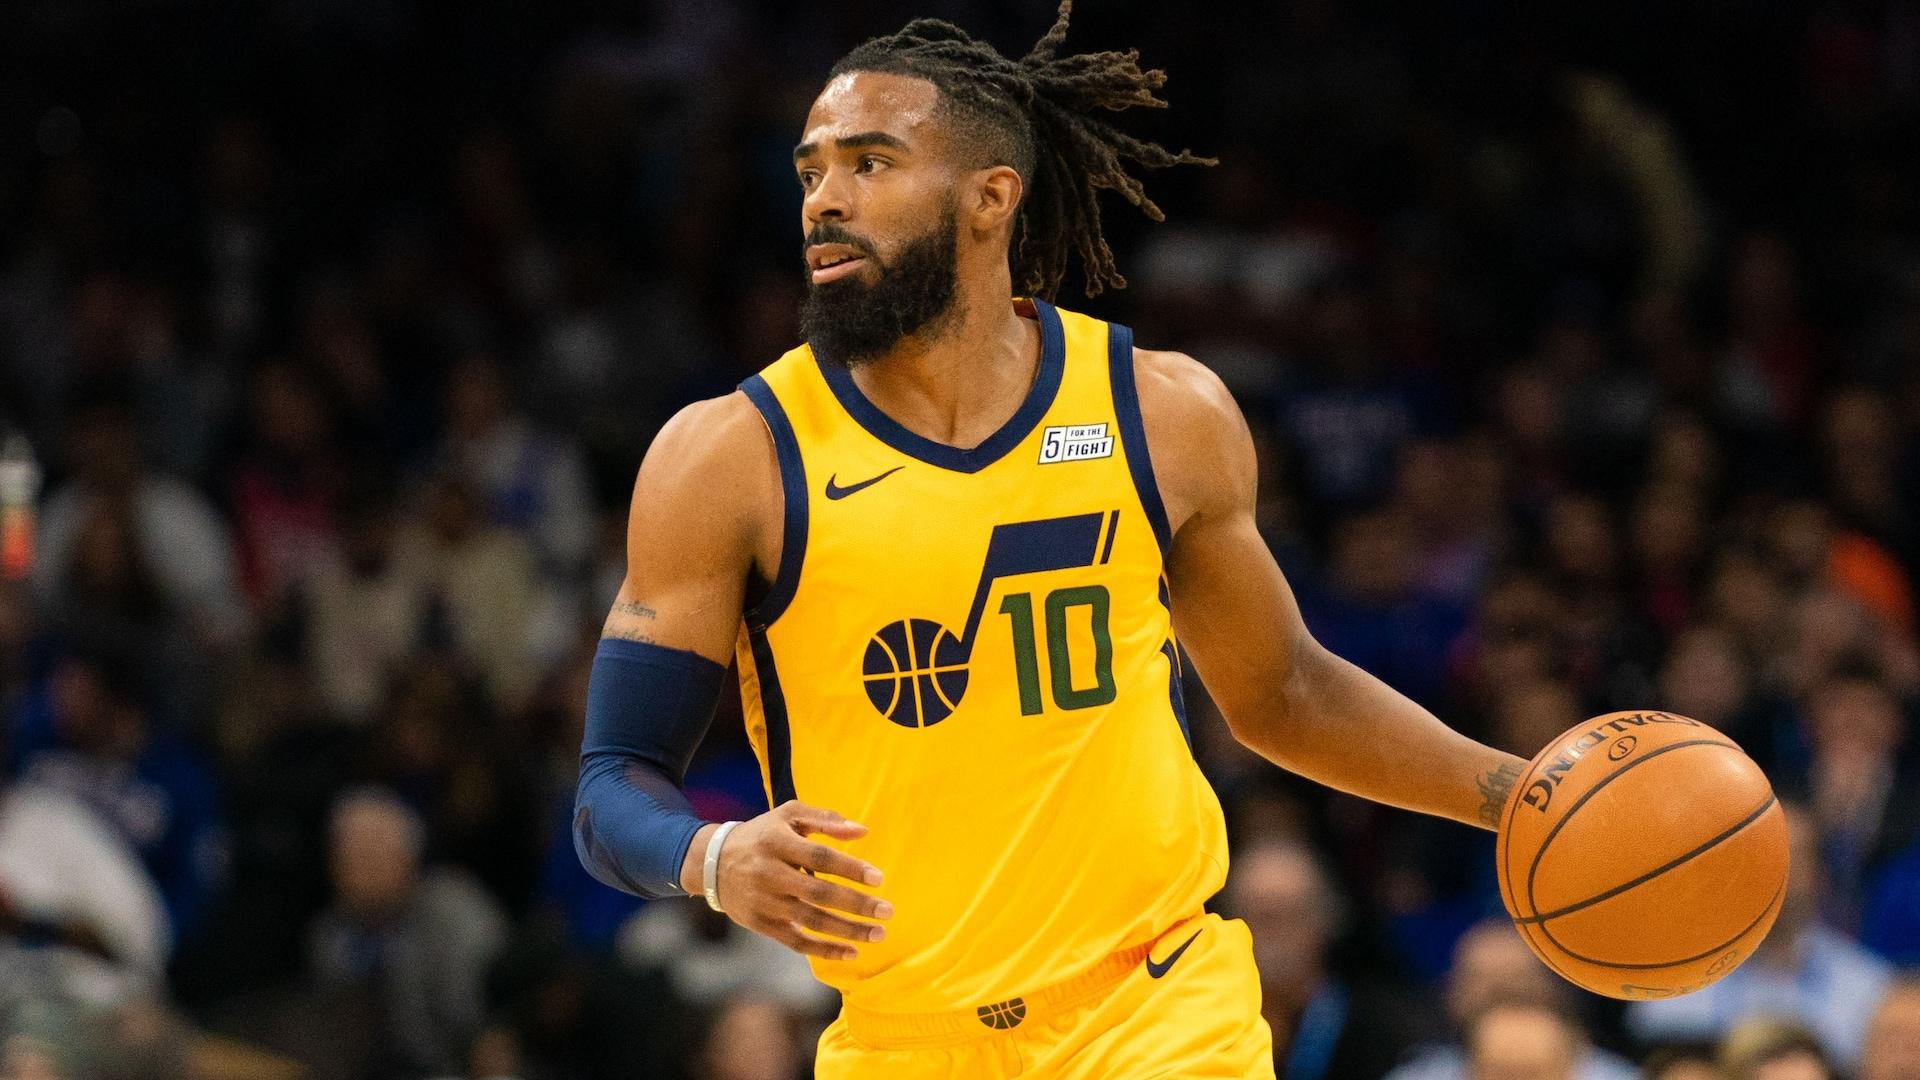 Players across NBA await news on season's next steps